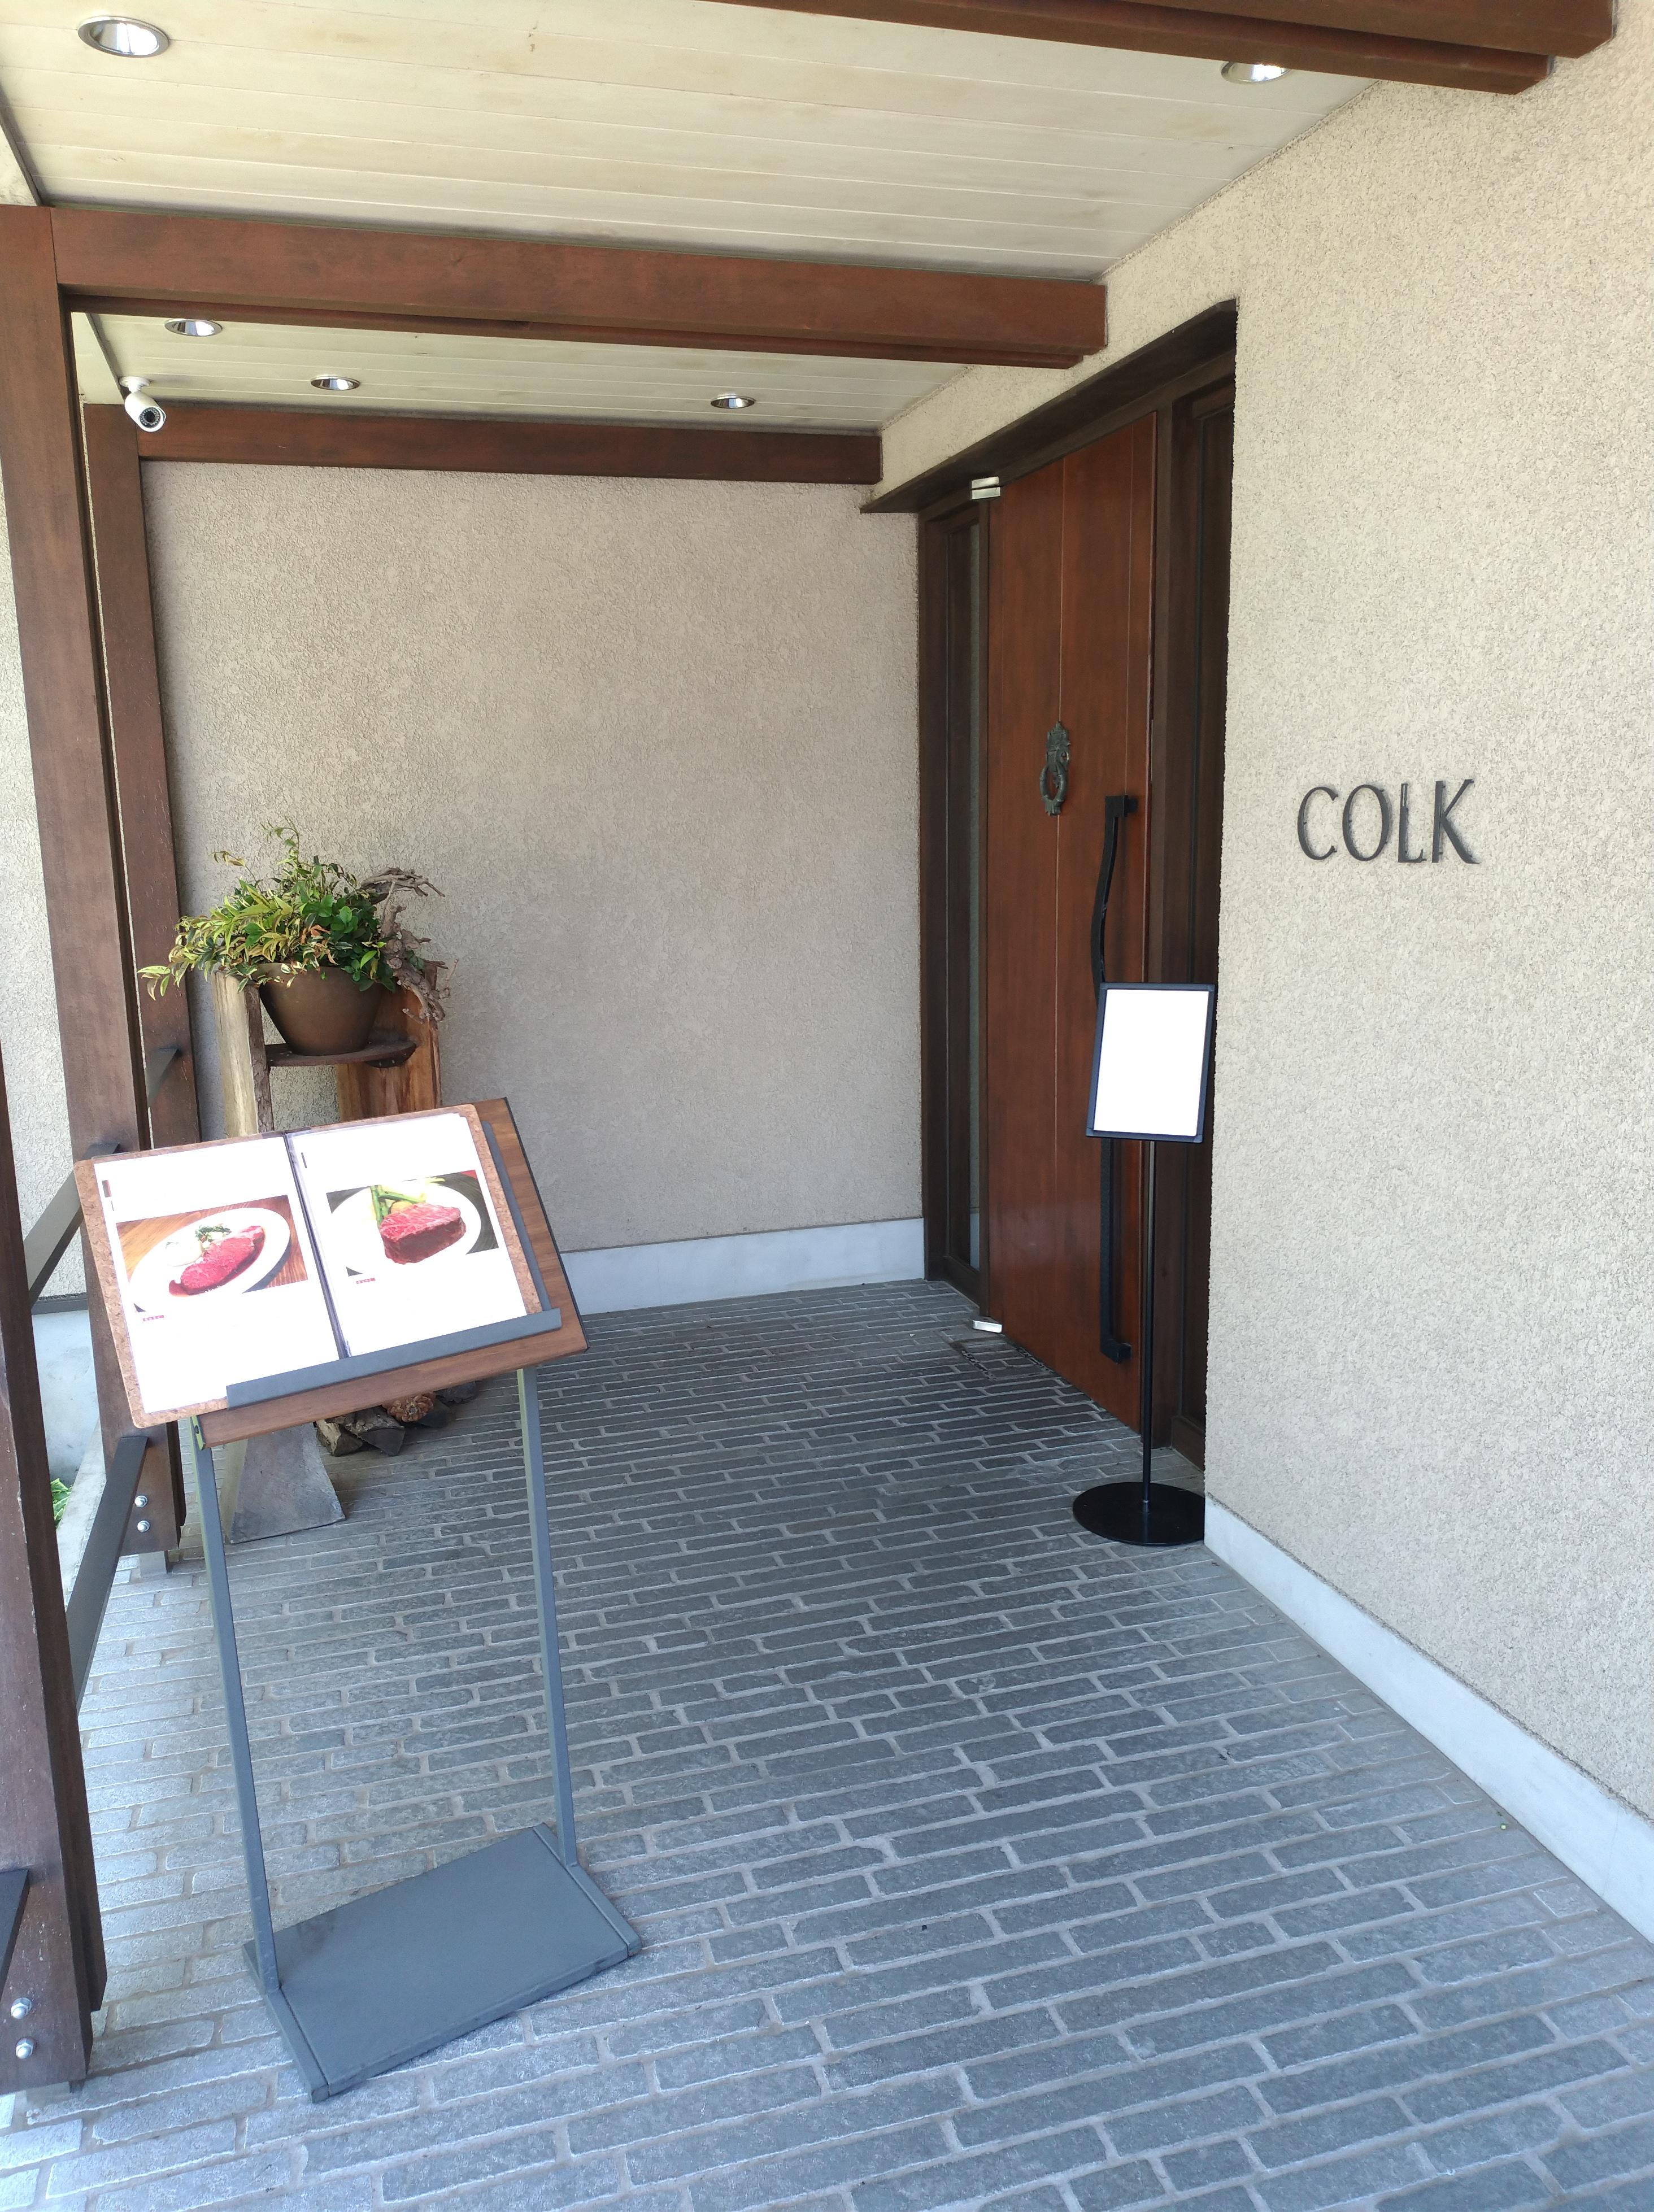 COLK(コルク)の入店